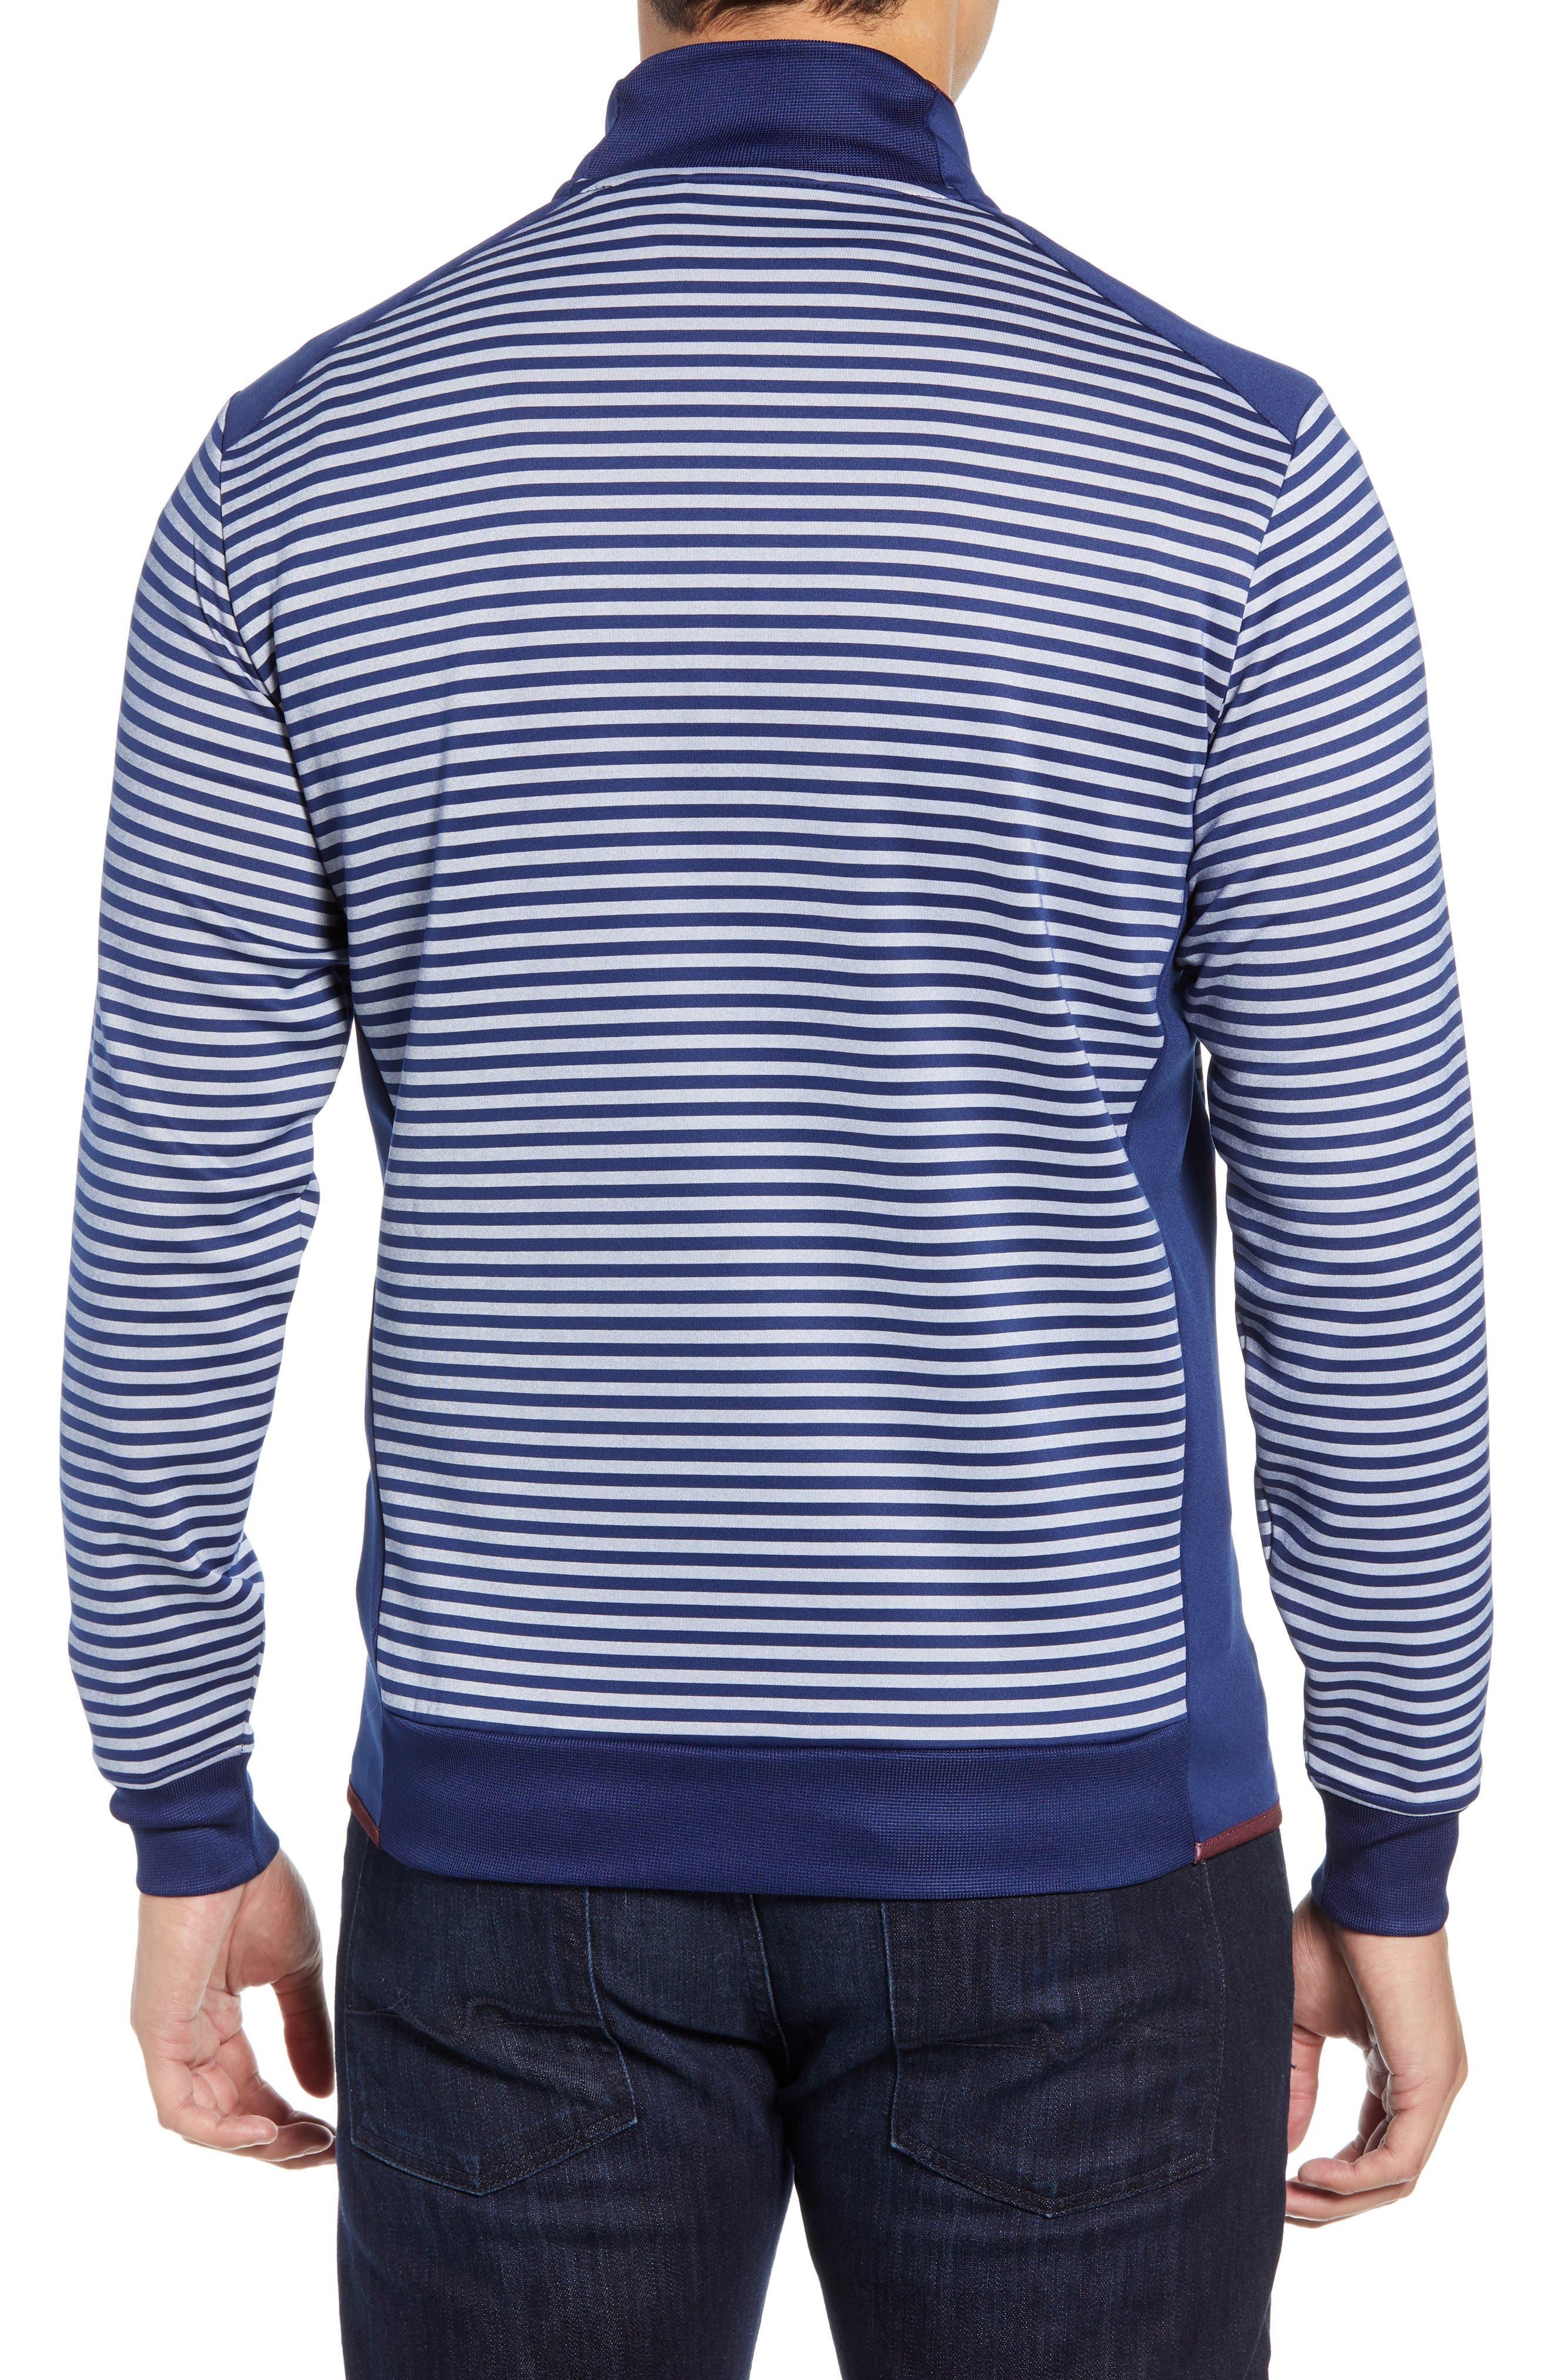 Regular Fit Stripe Quarter Zip Pullover,                             Alternate thumbnail 2, color,                             NAVY